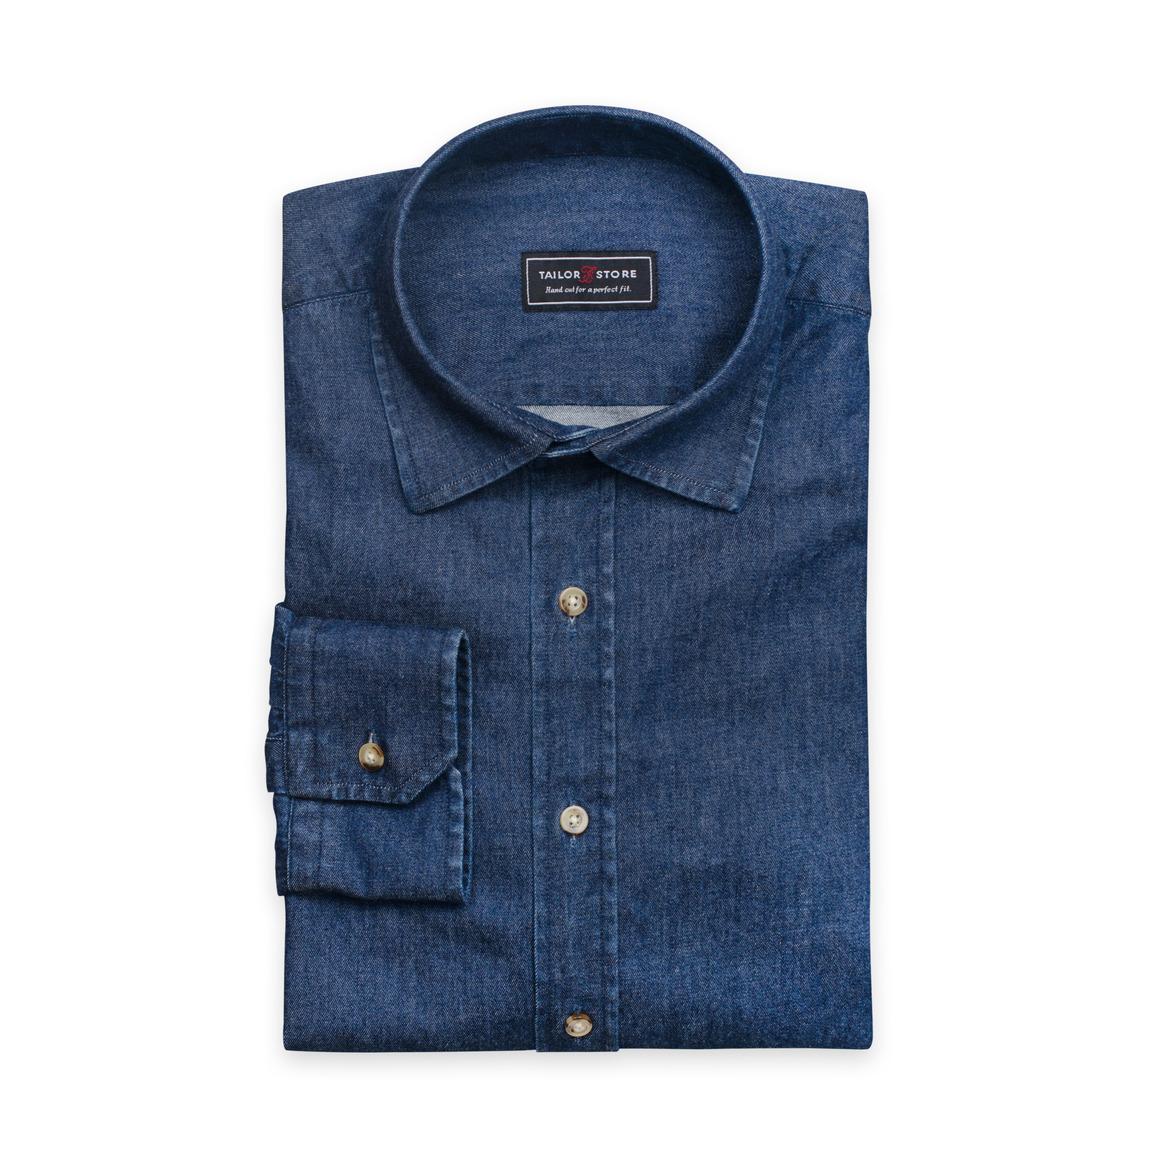 Dark blue denim shirt with business collar